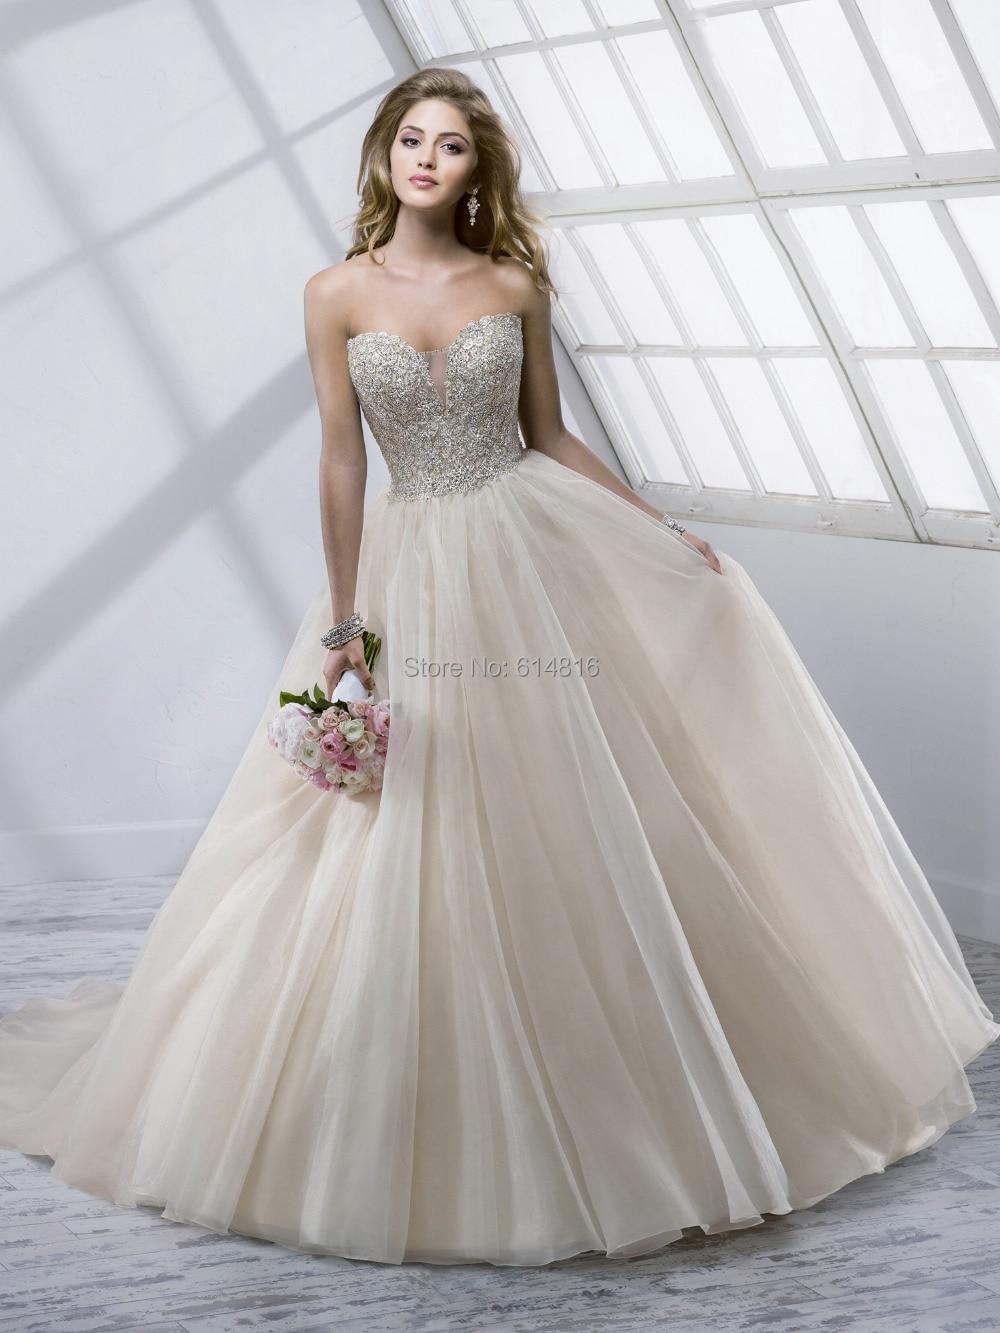 marchesa wedding dresses bridal fashion week spring romantic wedding dresses Marchesa Spring long sleeve wedding dress with plunging neckline and 3 D floral appliqu